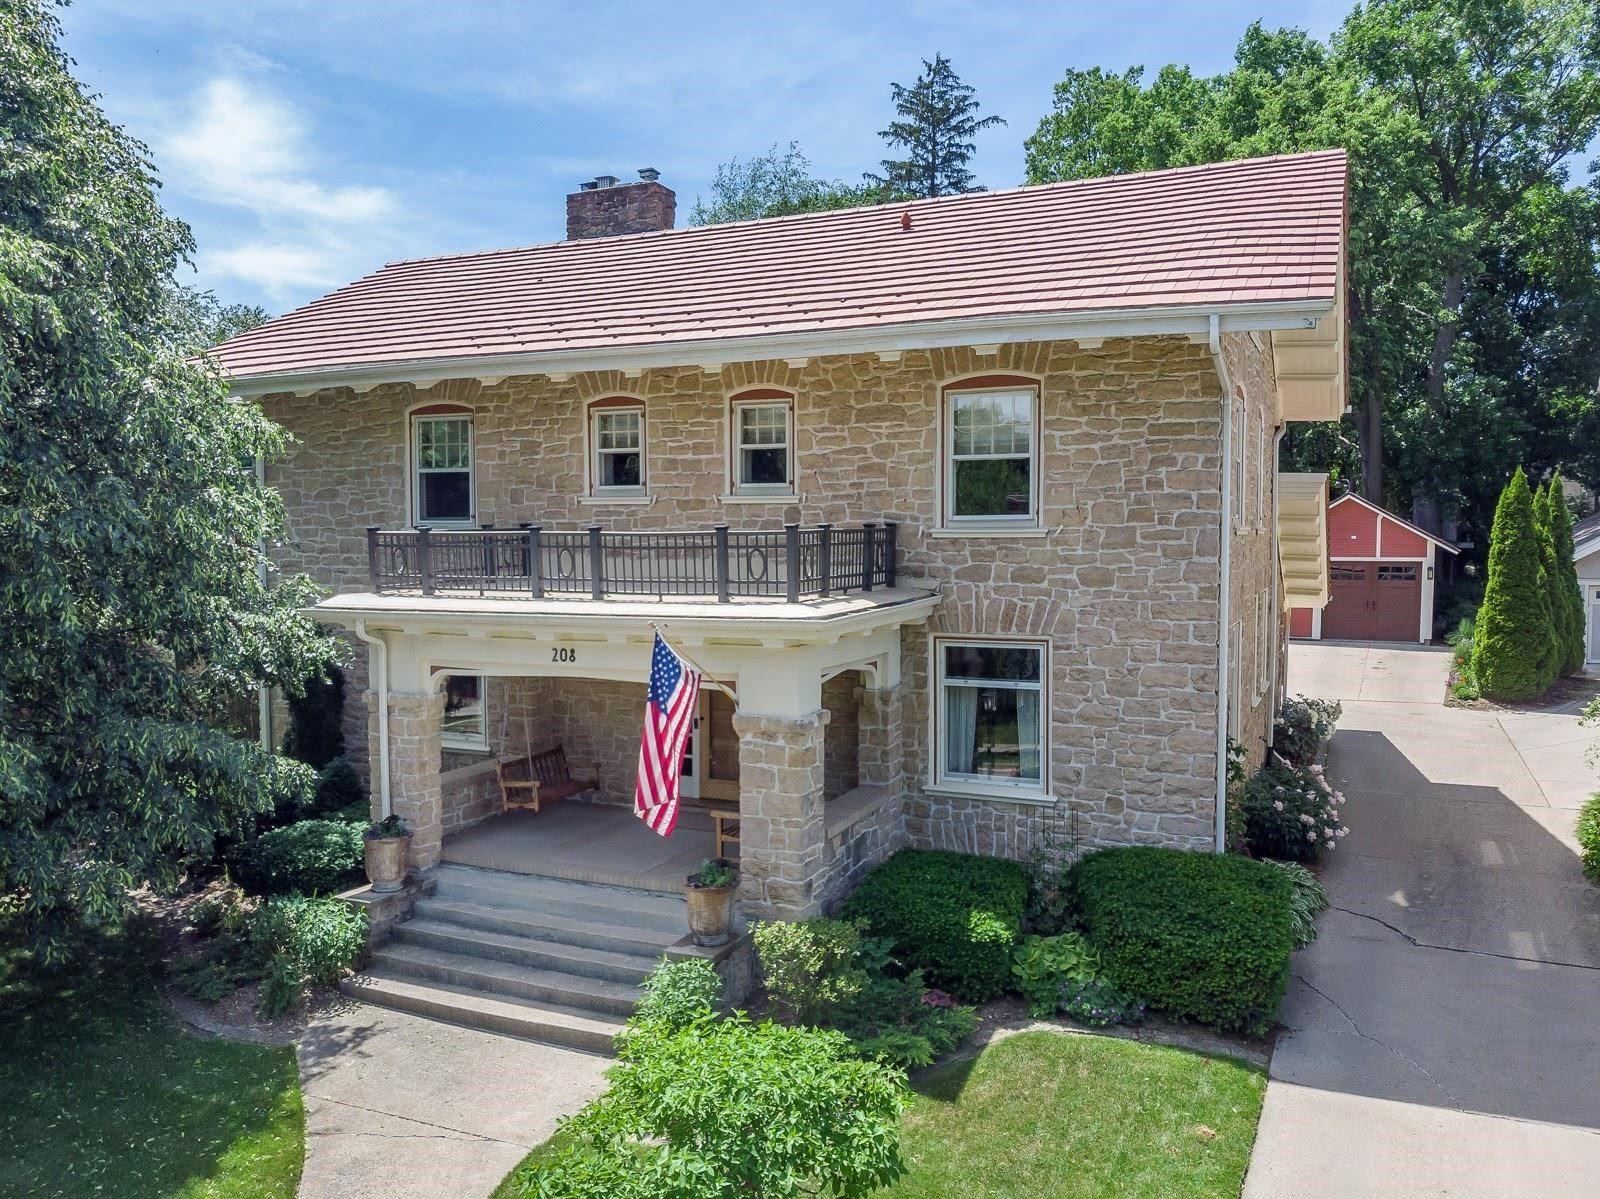 208 Lathrop St, Madison, WI 53726 - #: 1920157